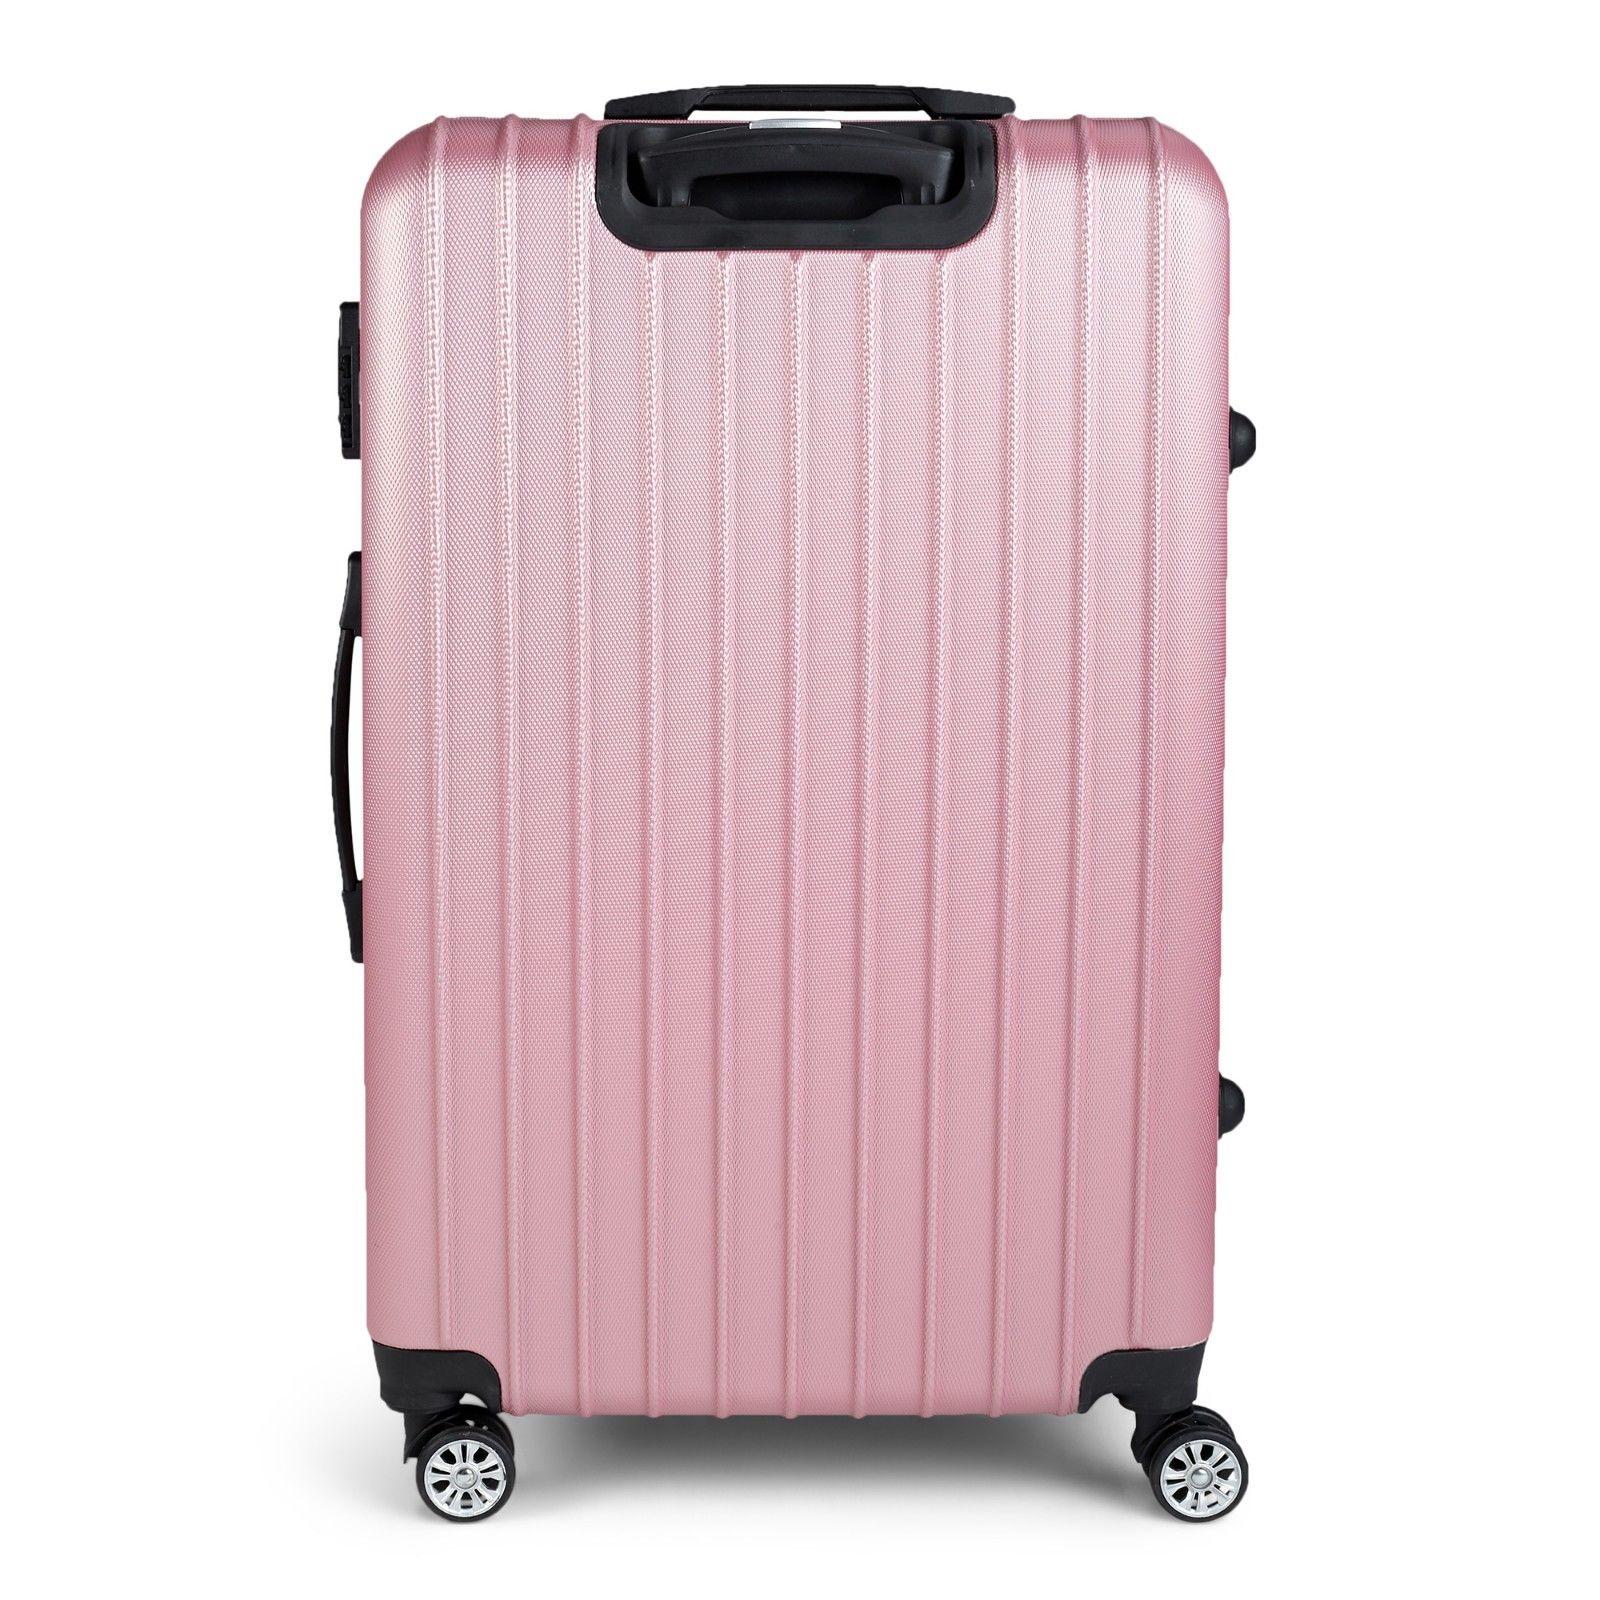 Milano-Premium-3pc-ABS-Luggage-Suitcase-Luxury-Hard-Case-Shockproof-Travel-Set thumbnail 21